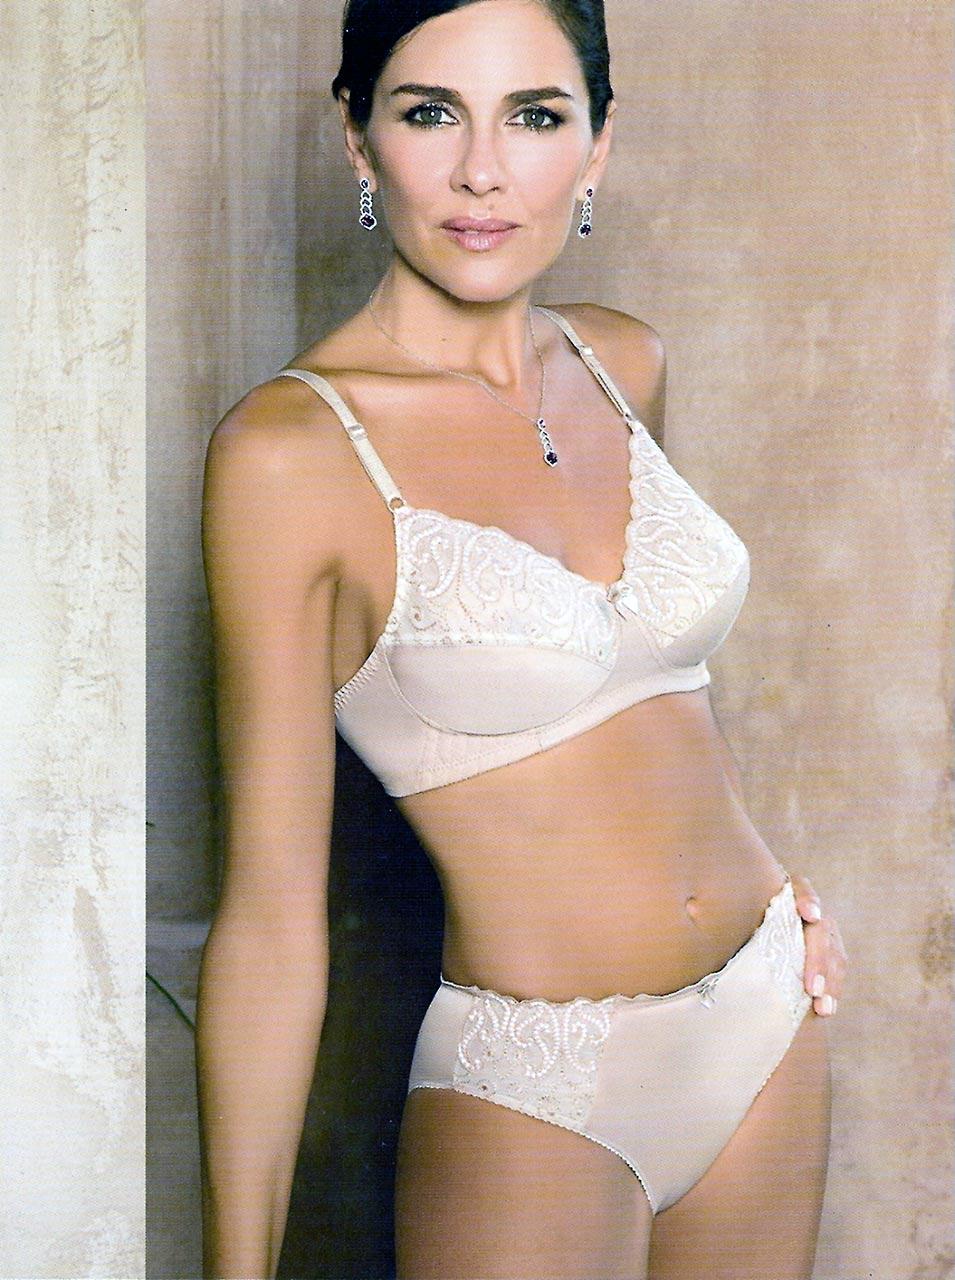 Andrea True Nude andrea frigerio nude scene & see through pics - scandal planet